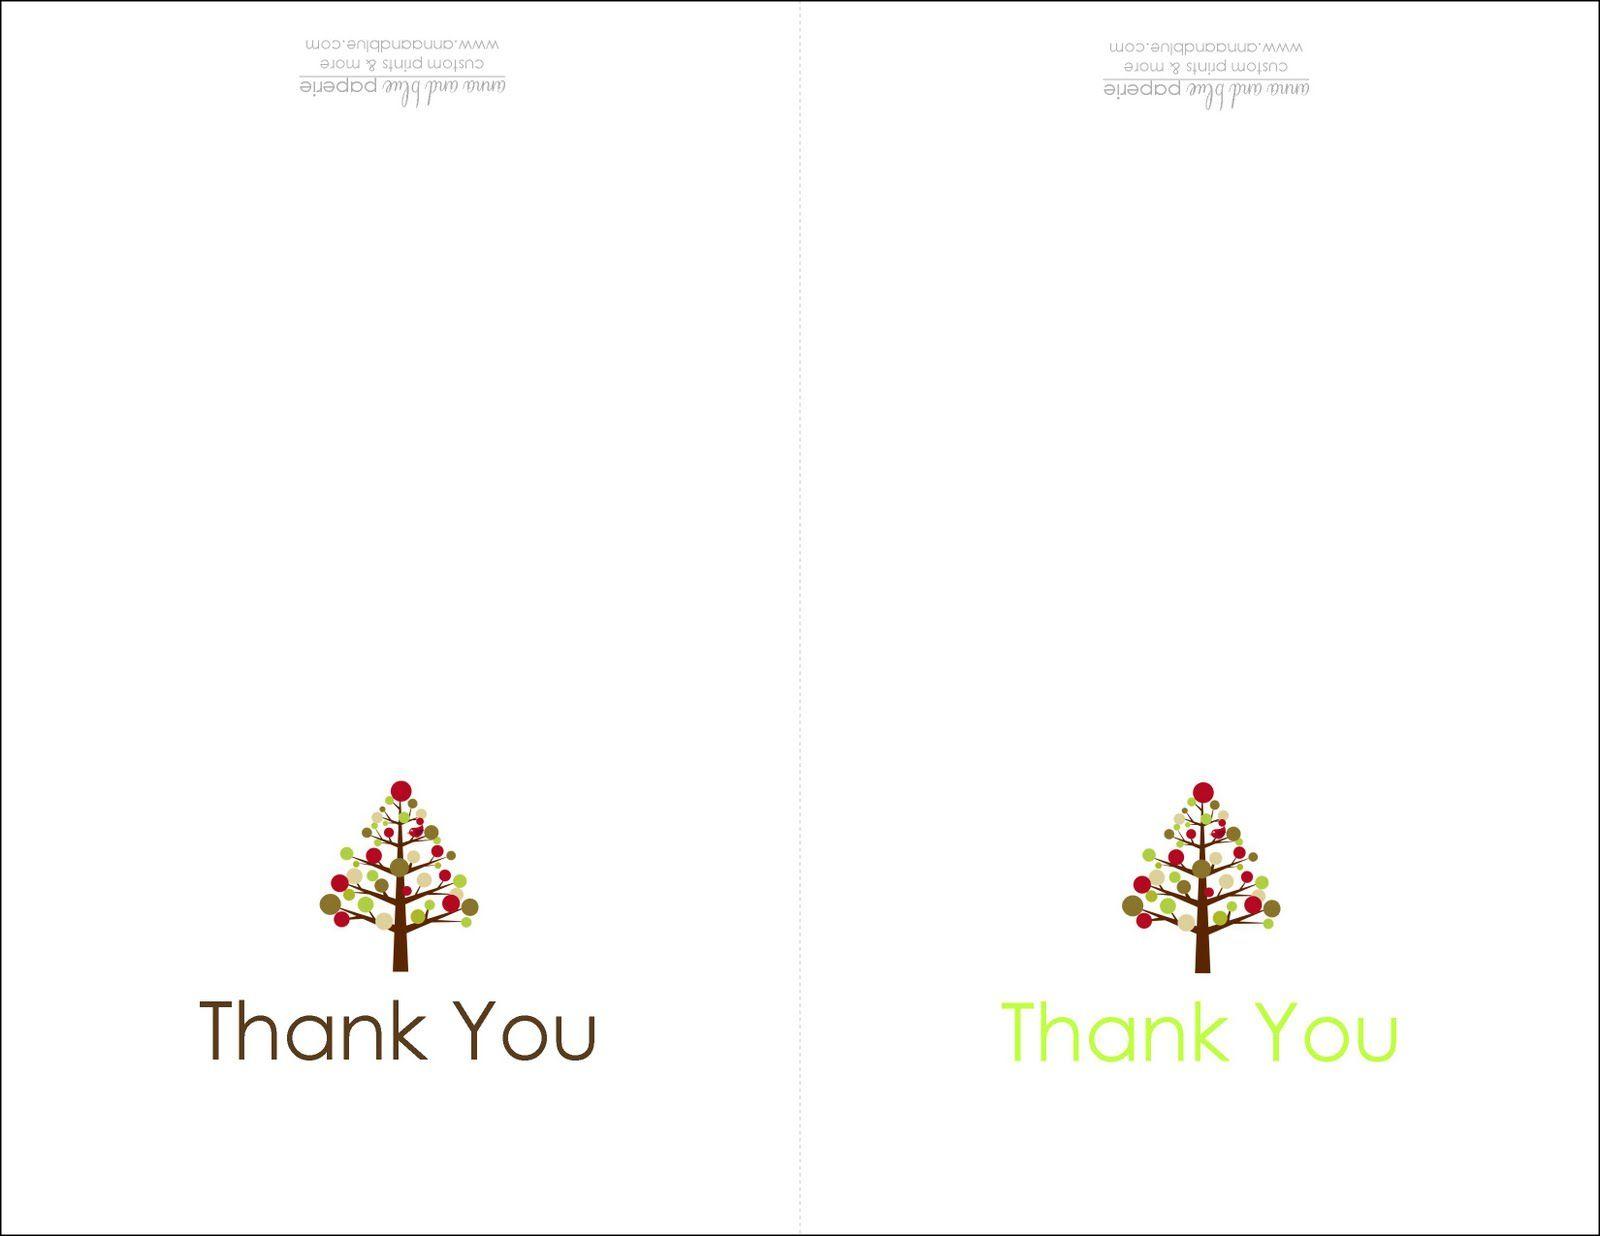 Thank You Cards Printable | Printable | Free Printable Christmas - Christmas Thank You Cards Printable Free